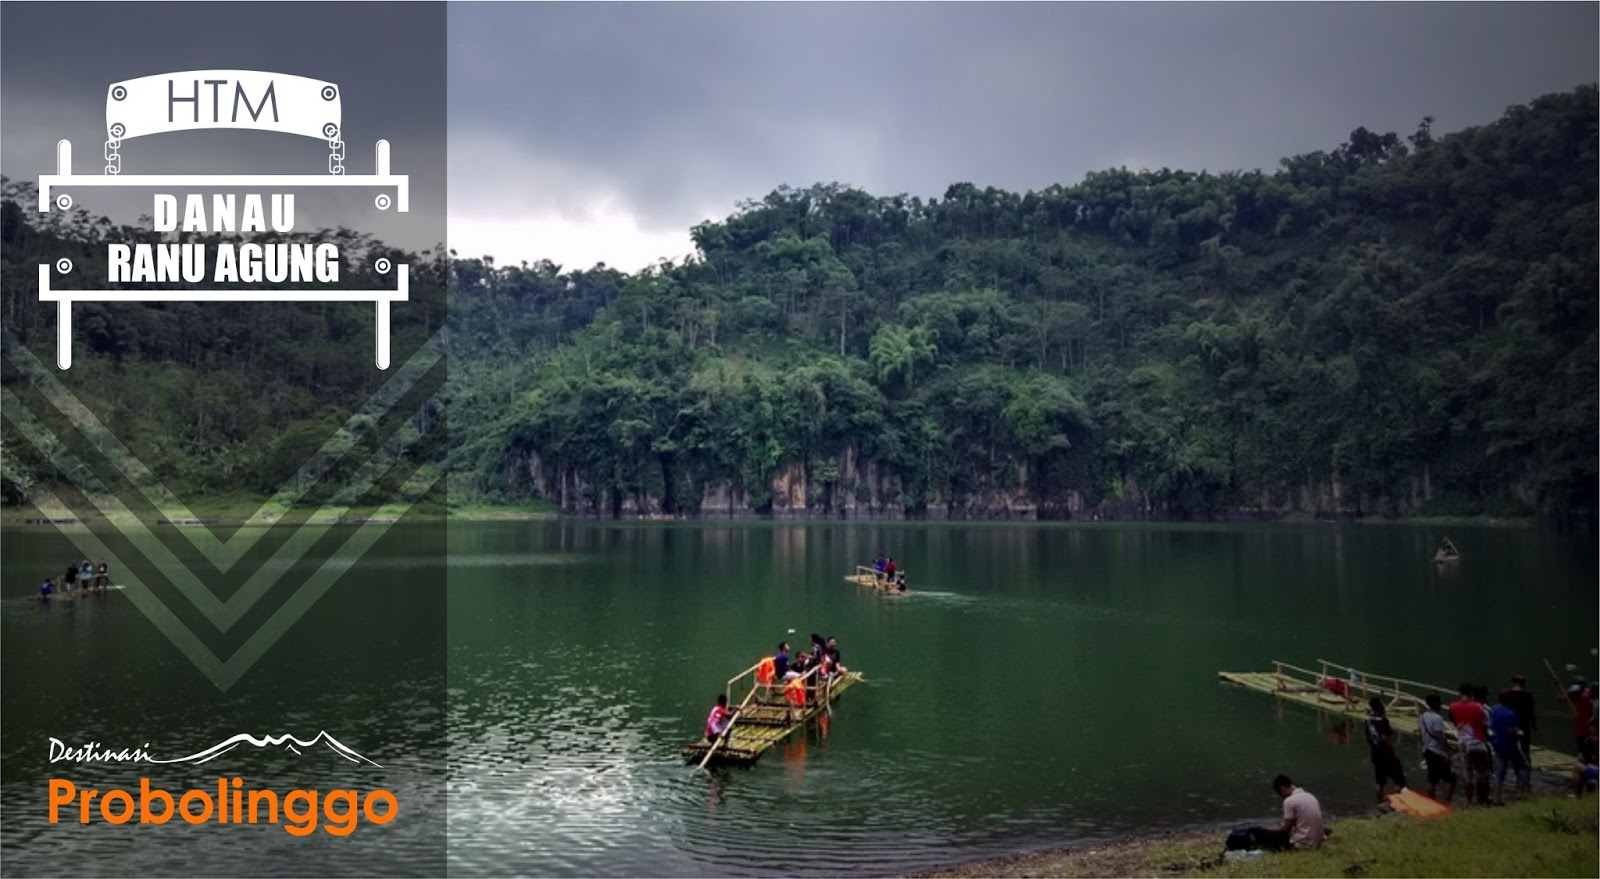 Danau Ranu Agung Probolinggo